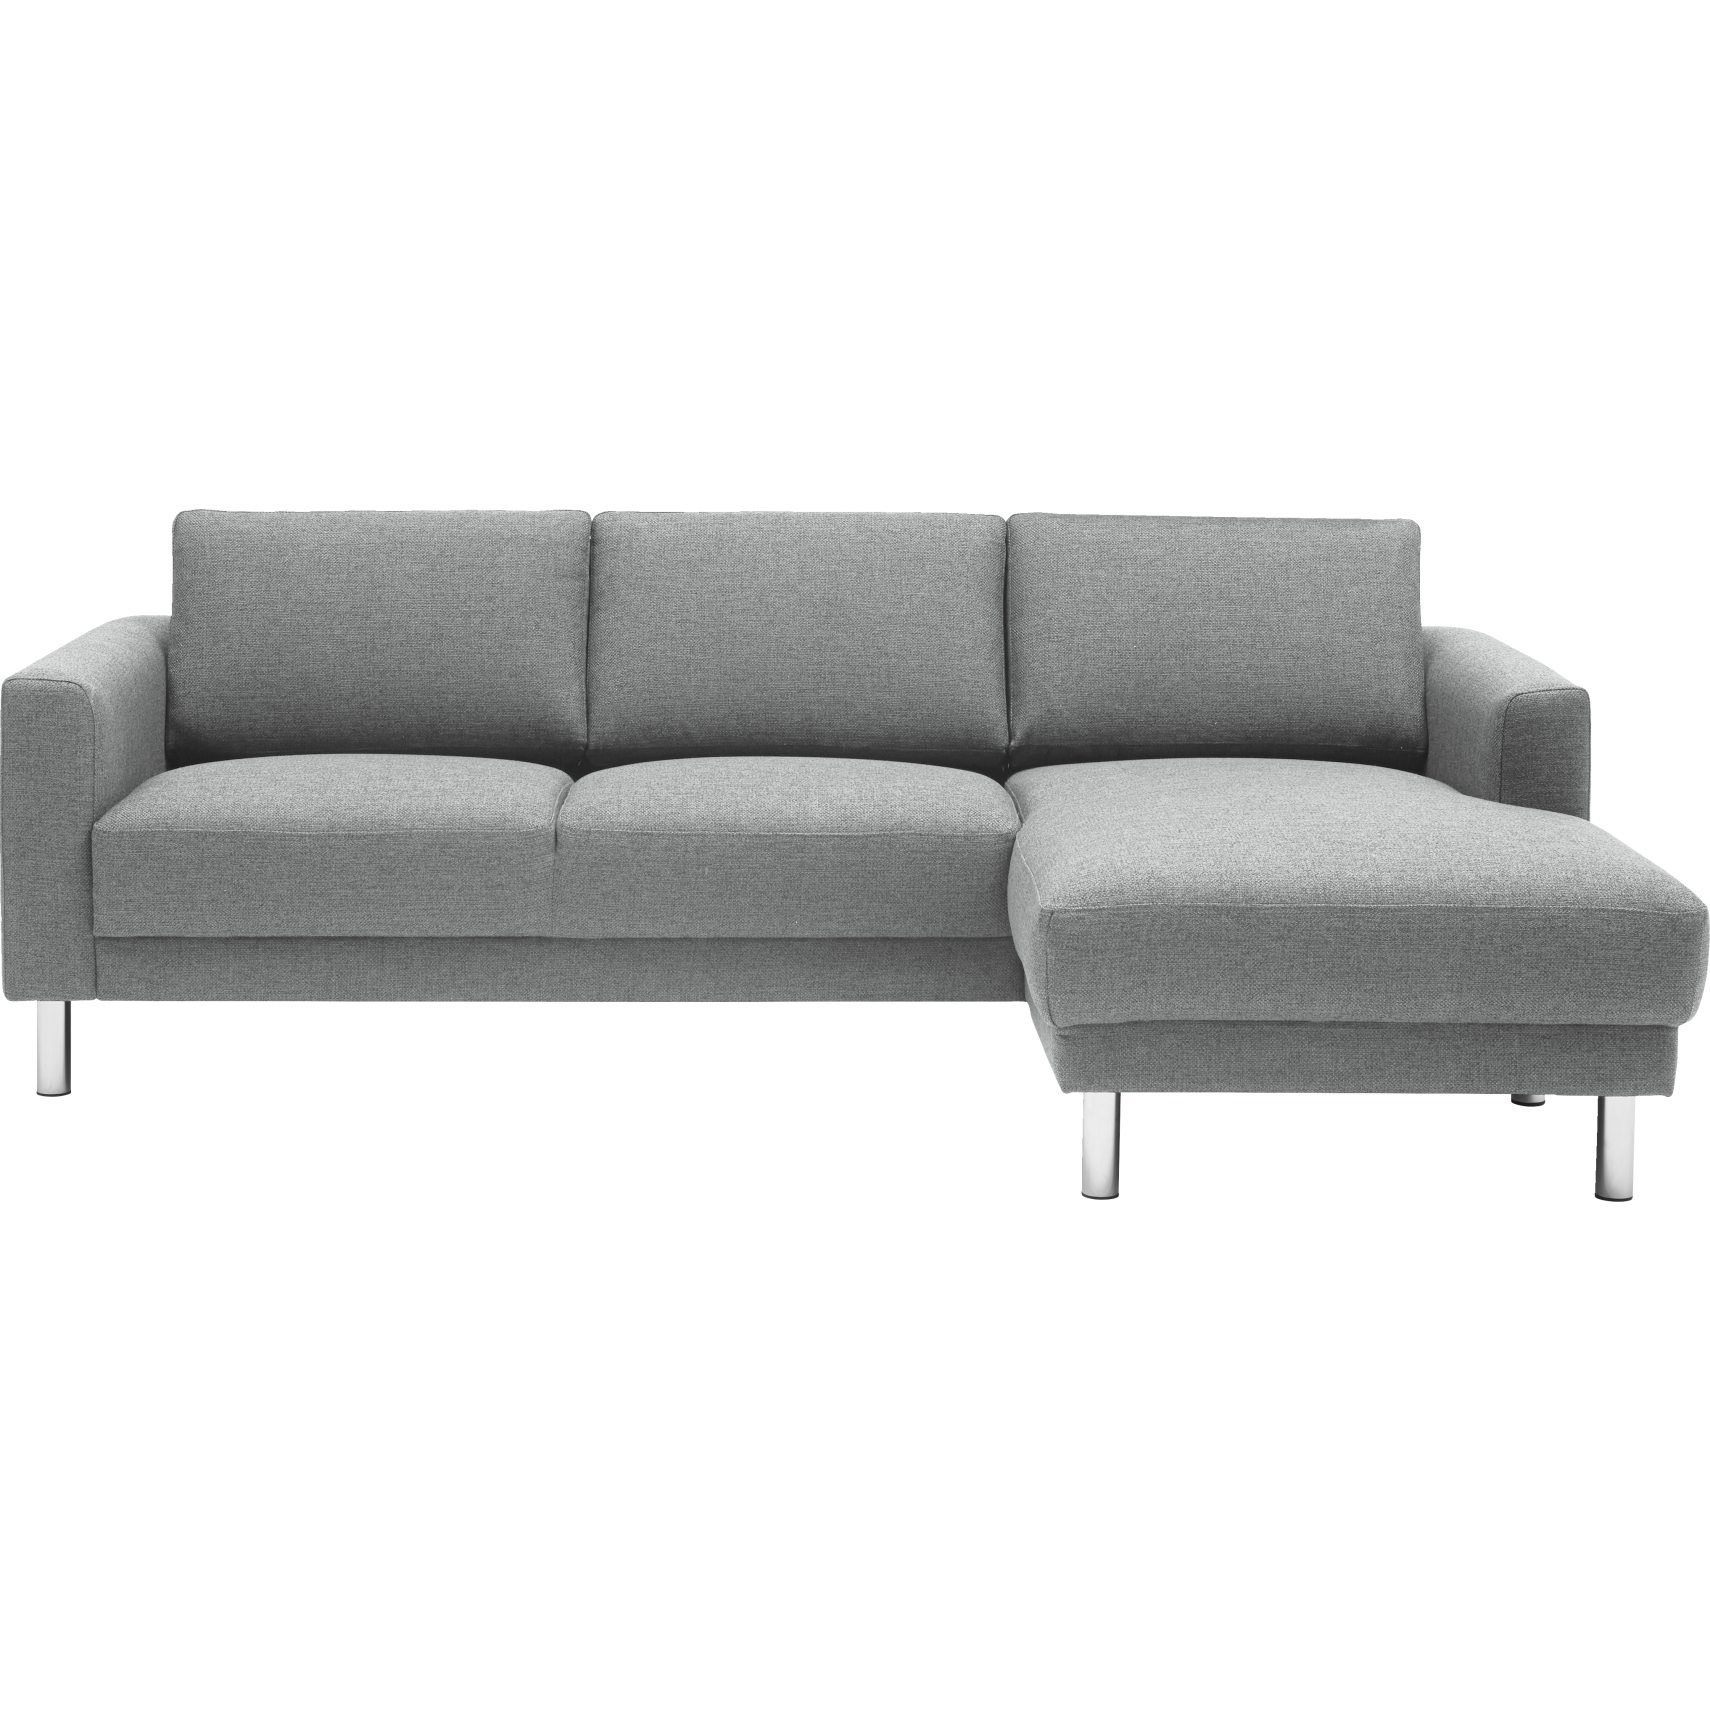 Kanapee Sofa andorra sofa med chaiselong andorra apartments and house